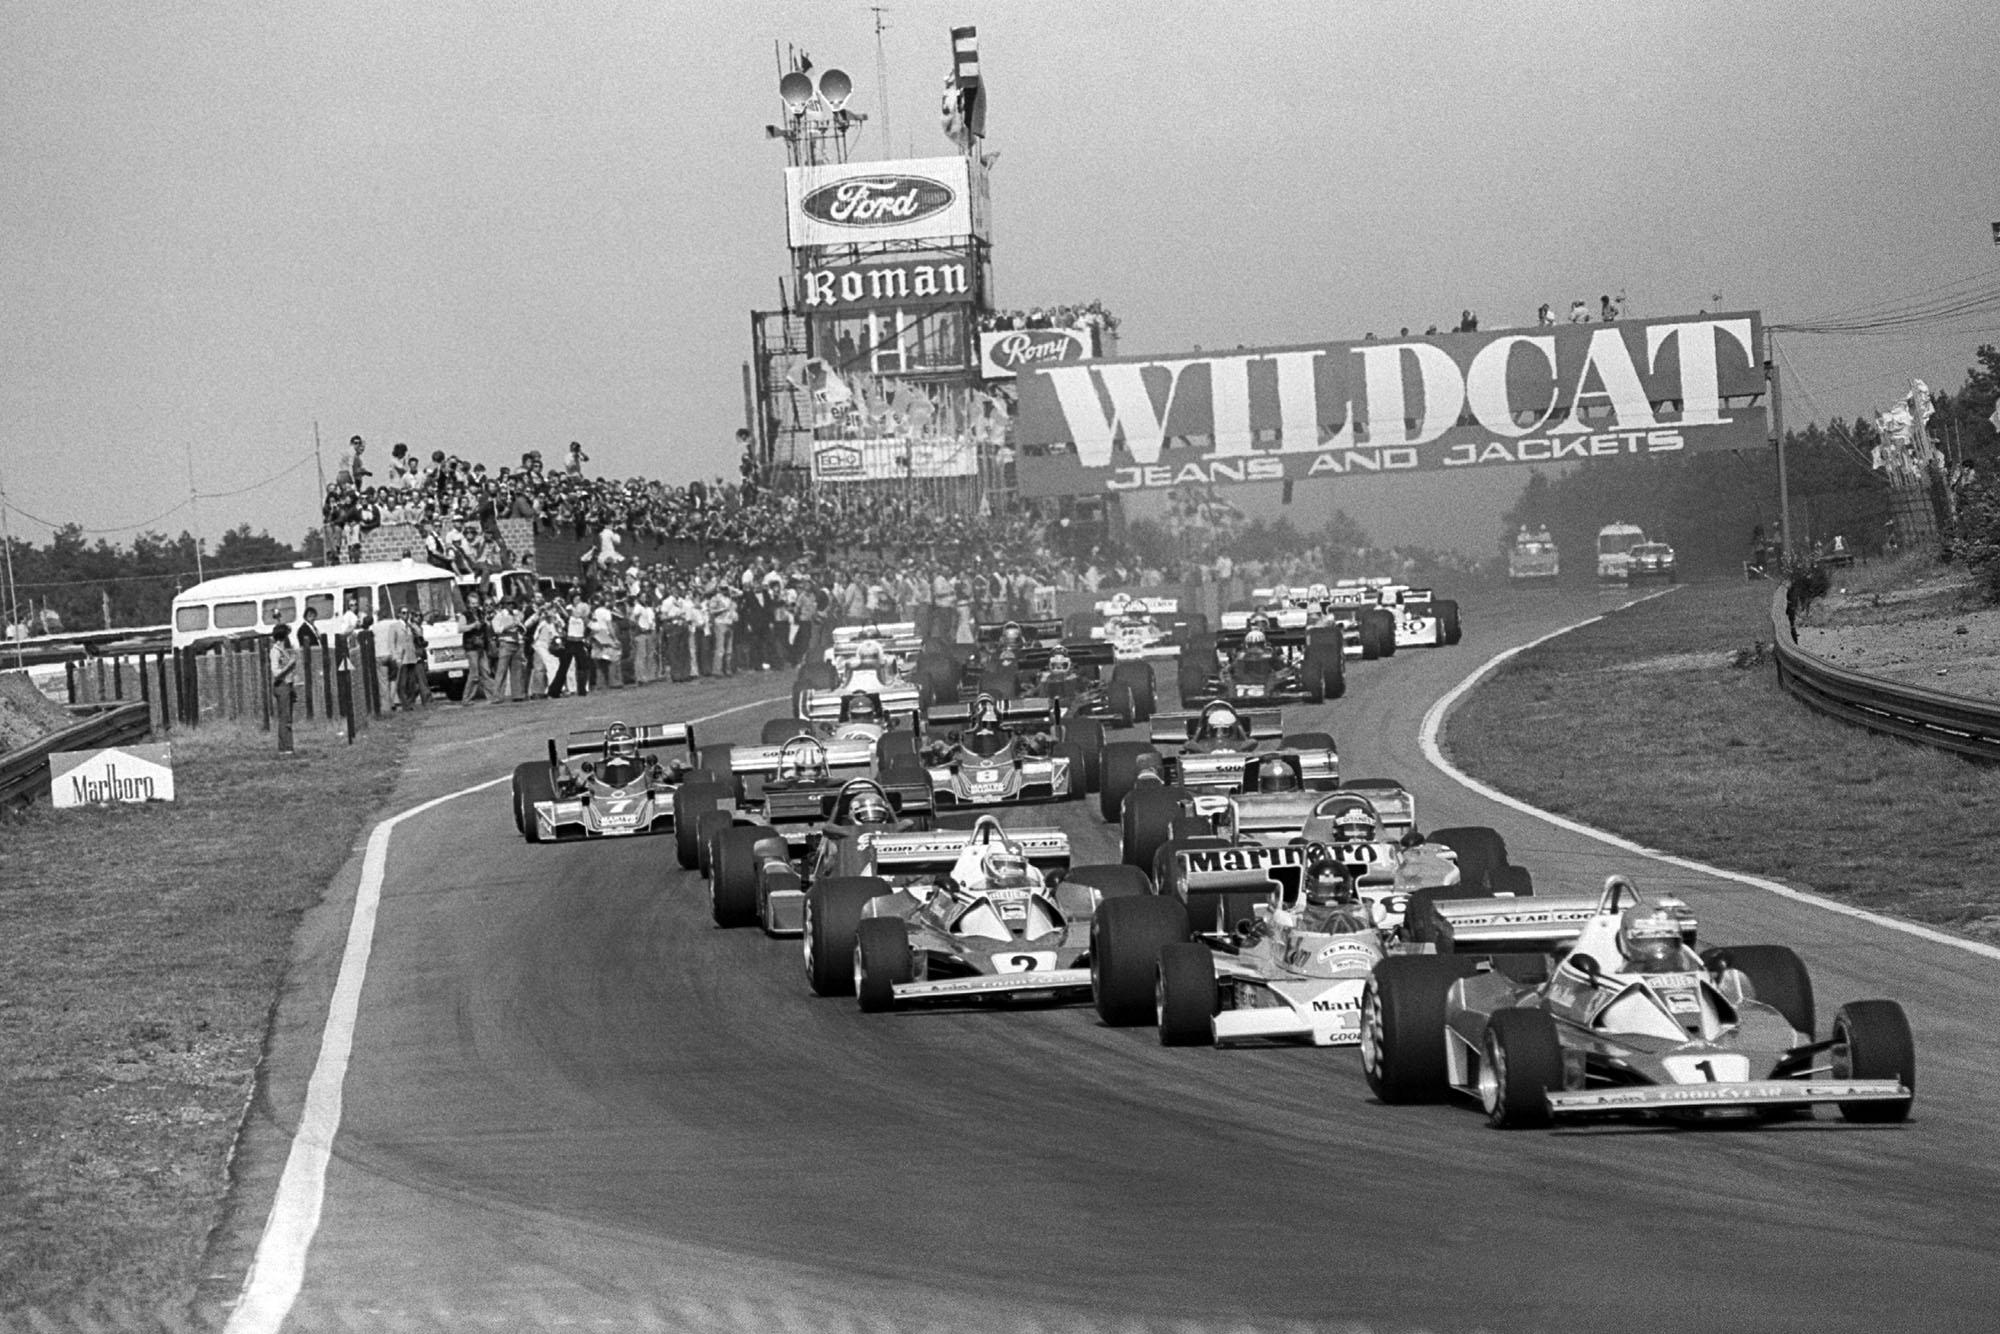 The field heads into Turn 1, 1976 Belgian Grand Prix, Zolder.